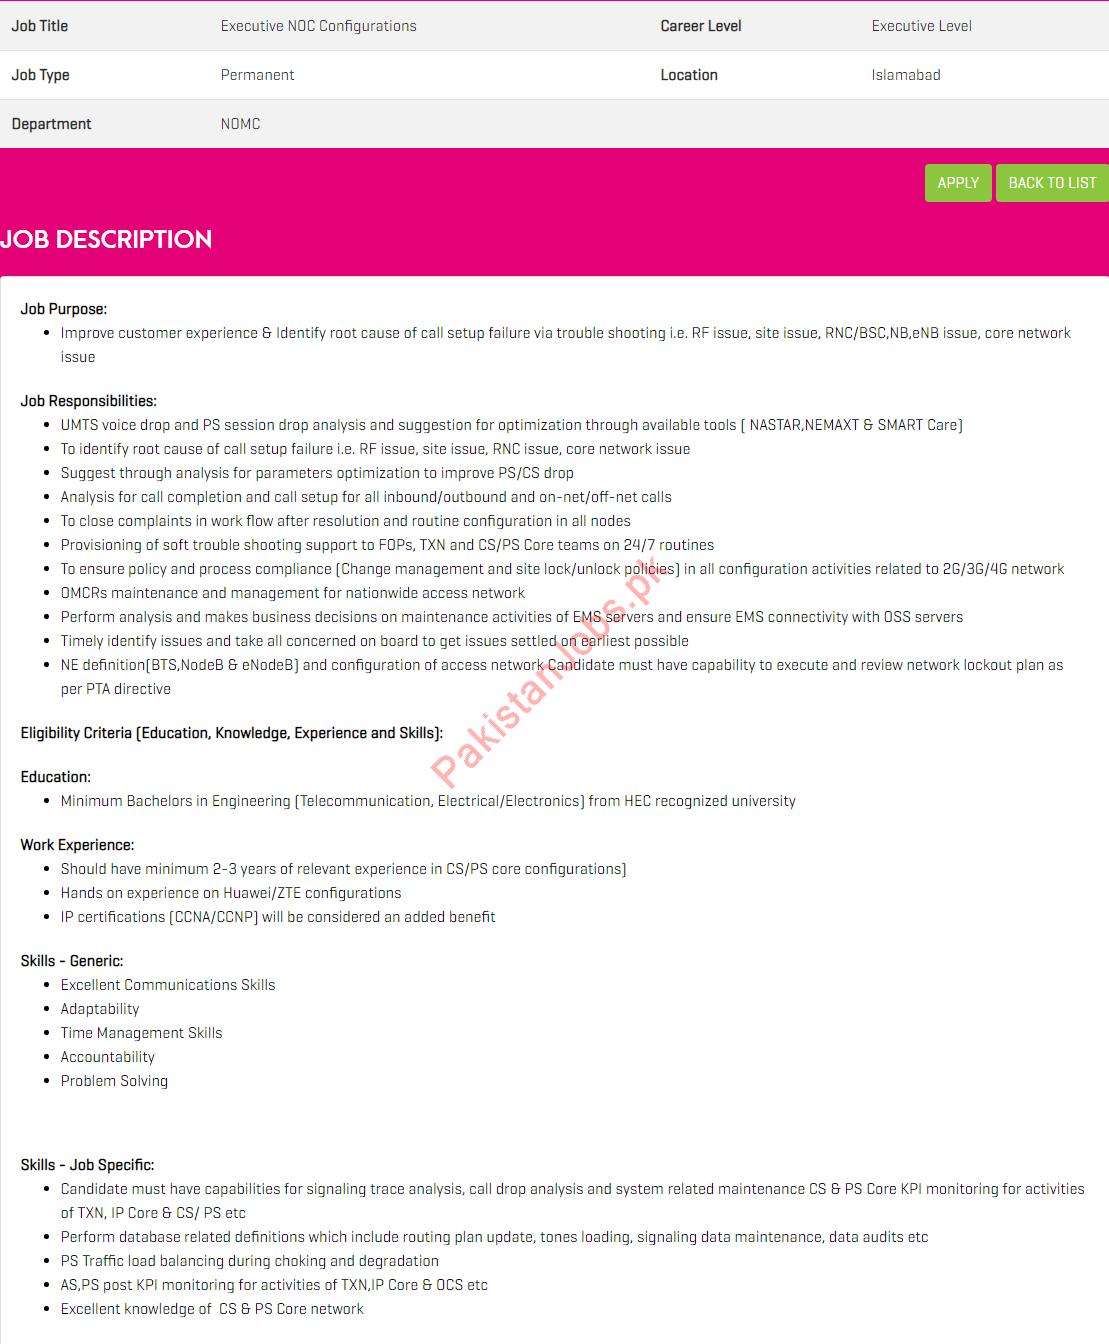 Executive NOC Configurations Jobs in Zong Pakistan